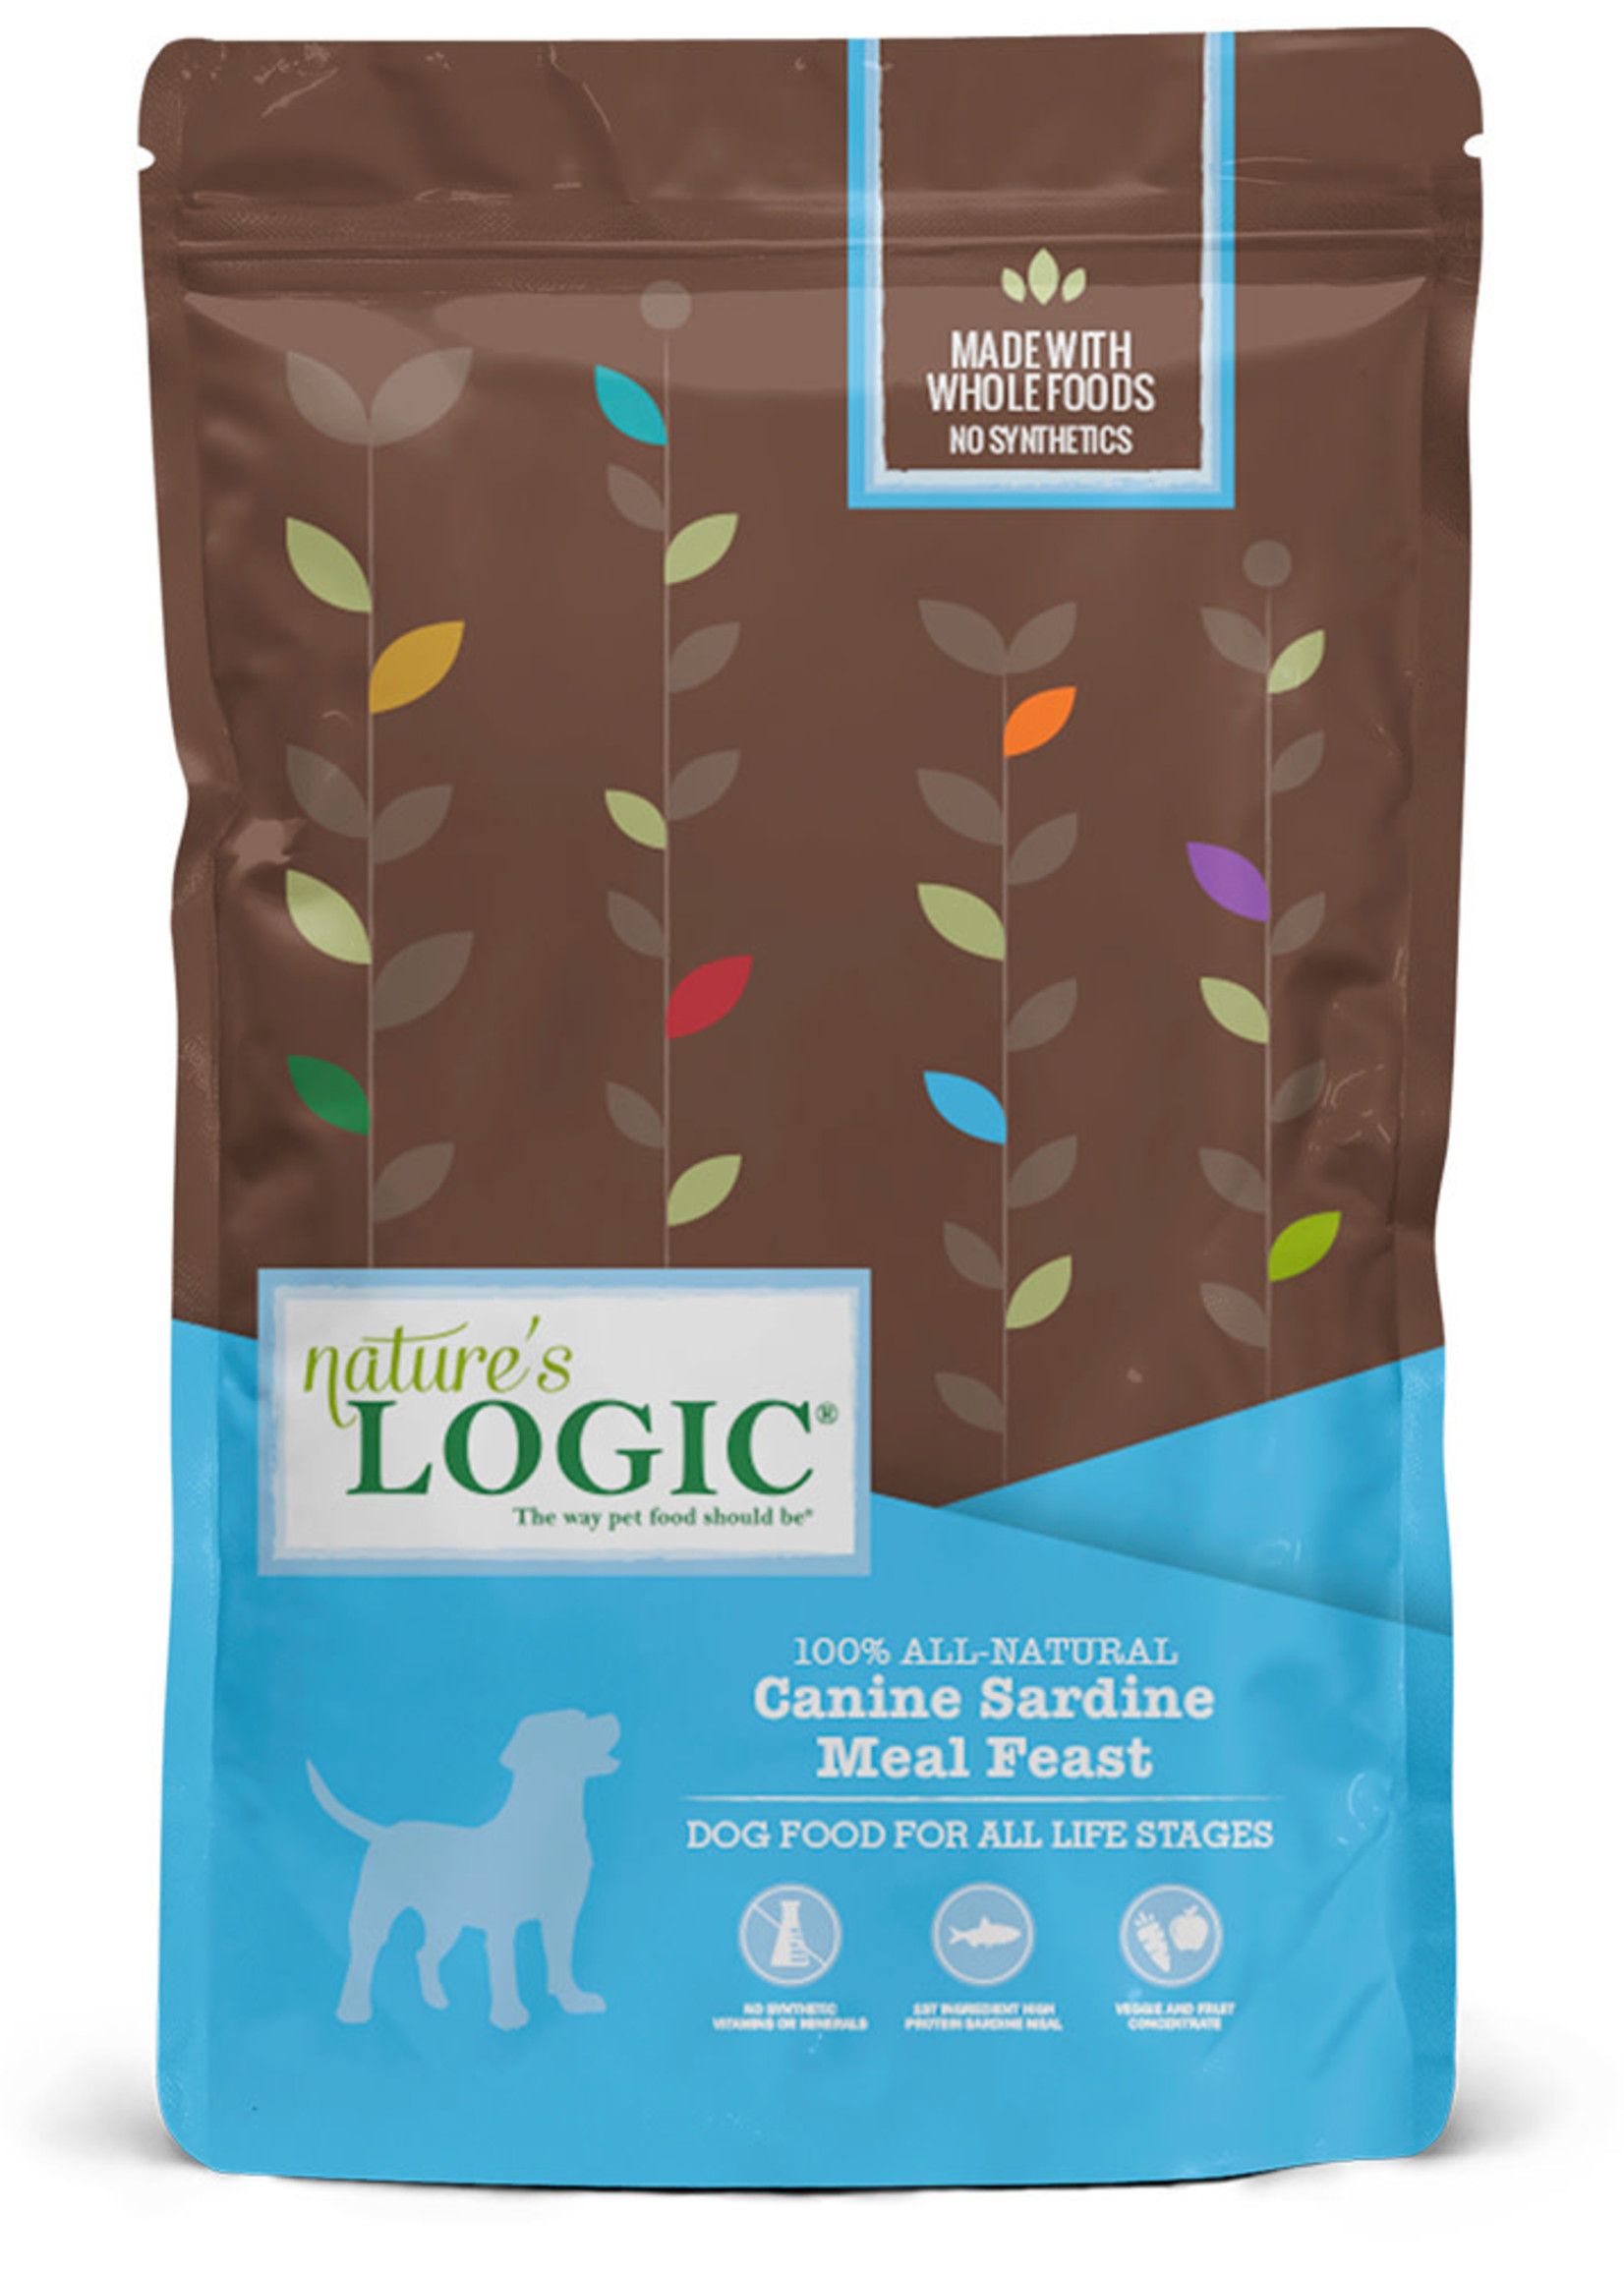 Nature's Logic Nature's Logic Grain-Free Canine Lamb Feast Dry Dog Food 4.4lbs